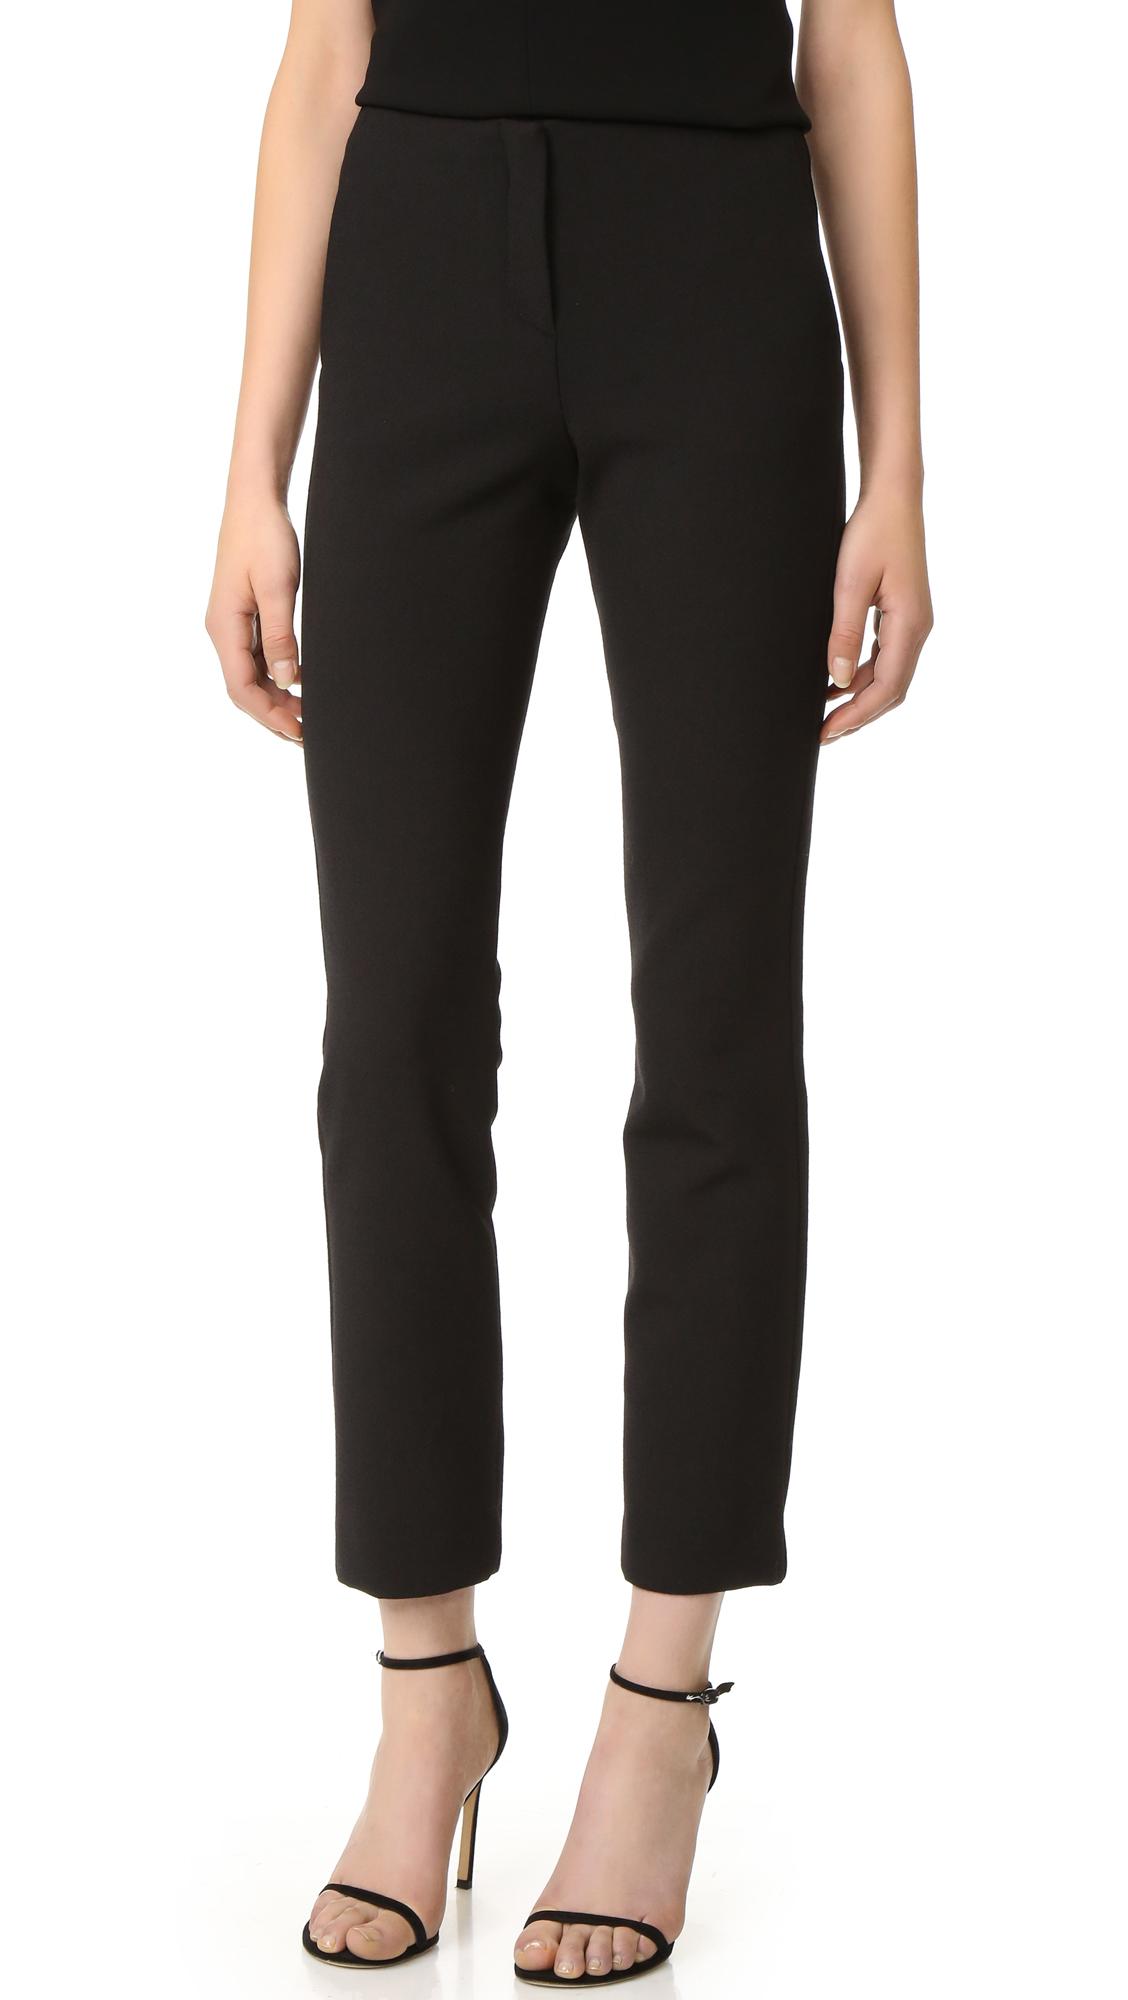 Theory Tennyson B Pants - Black at Shopbop